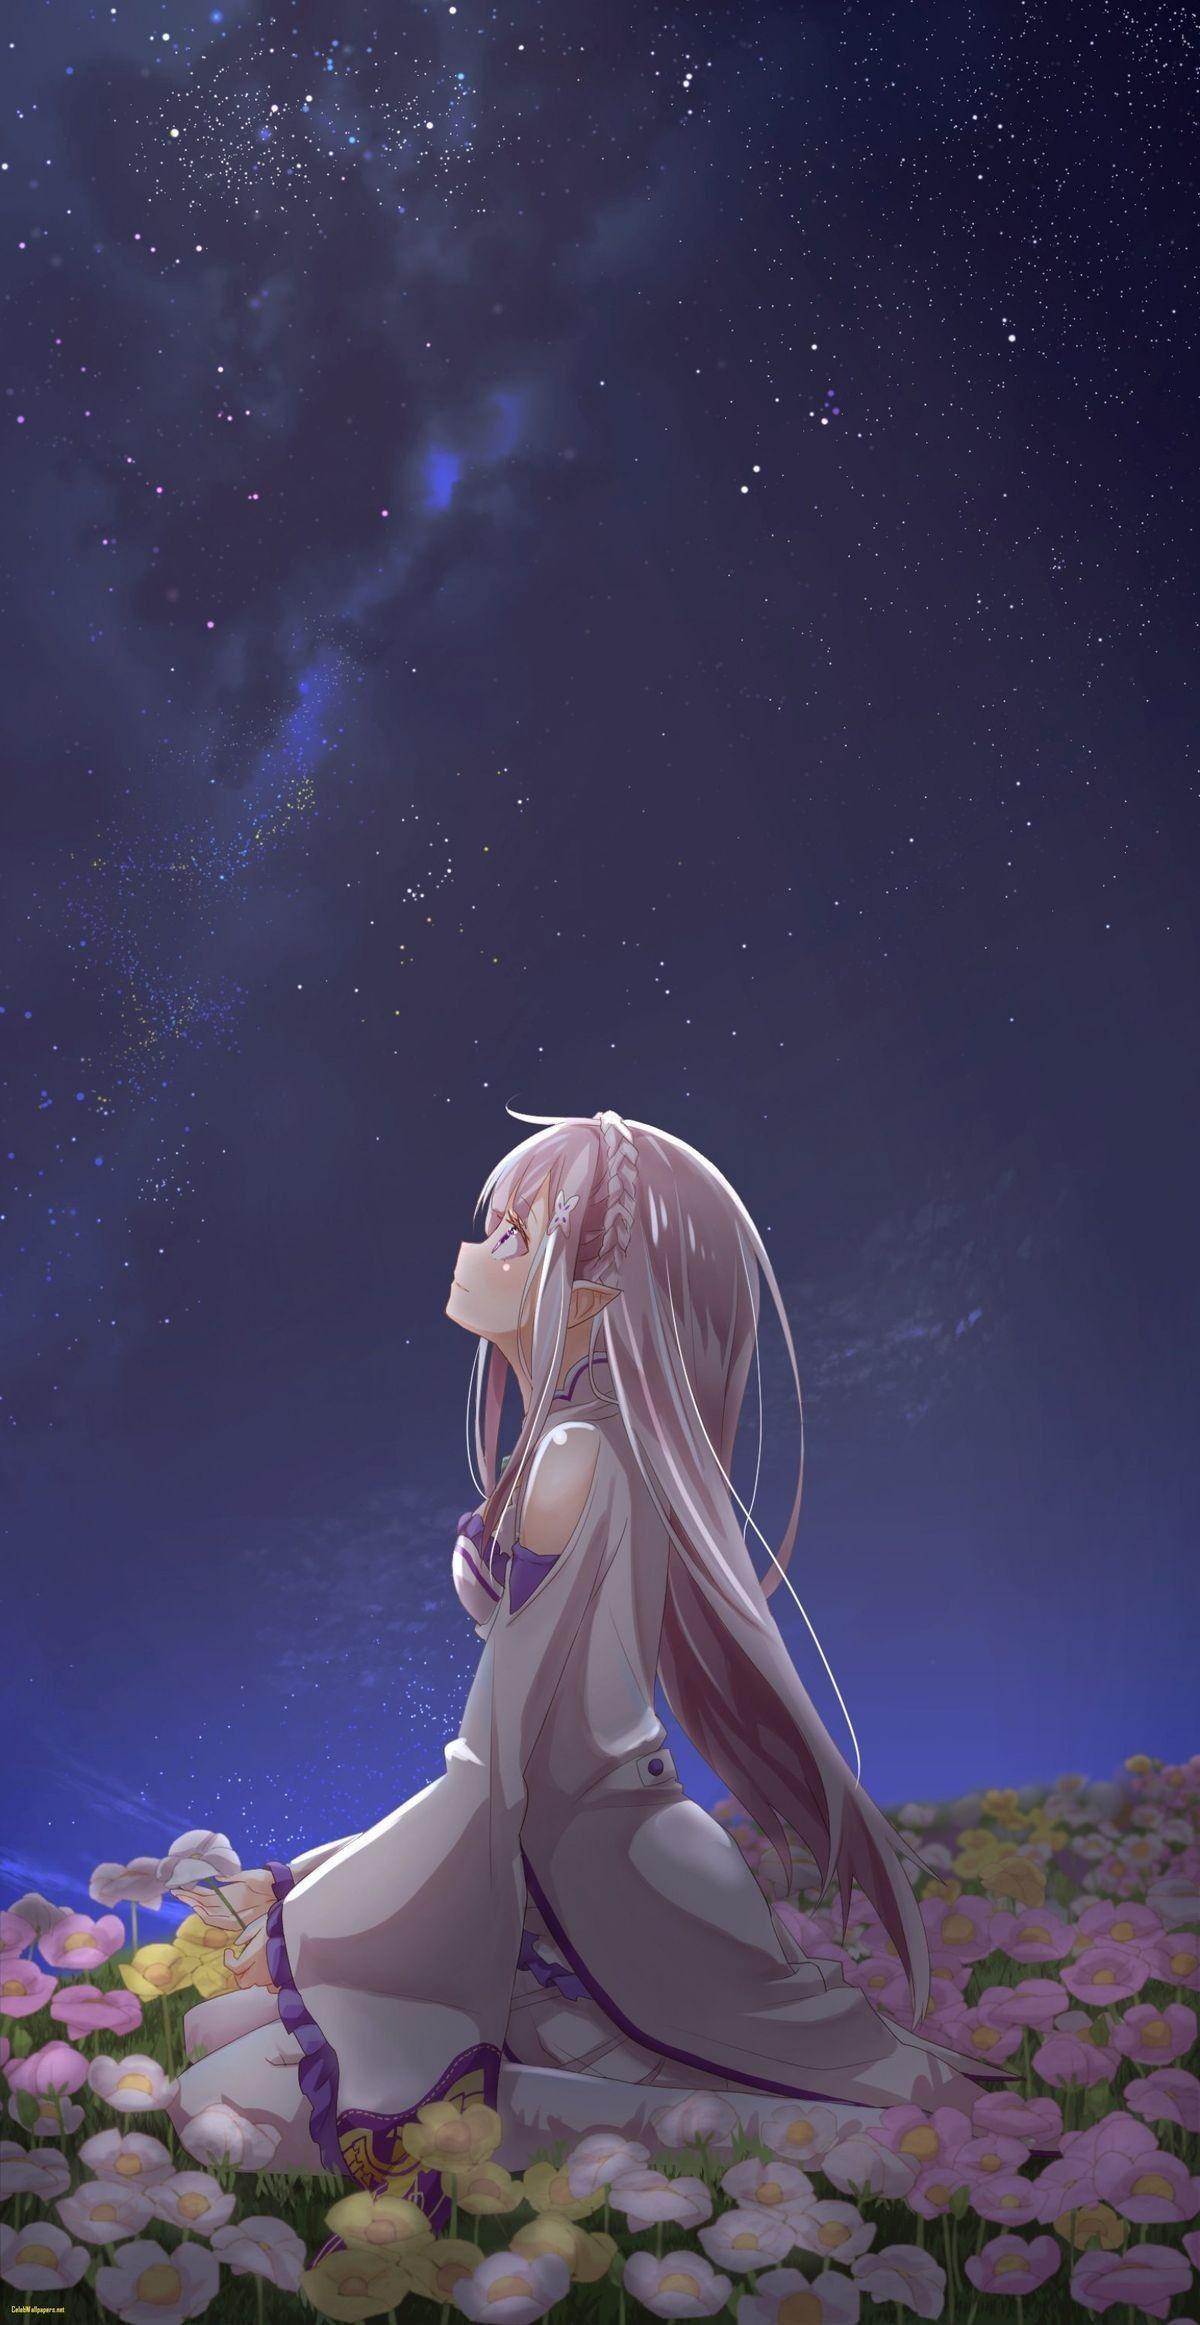 Emilia Anime background, Hd anime wallpapers, Anime